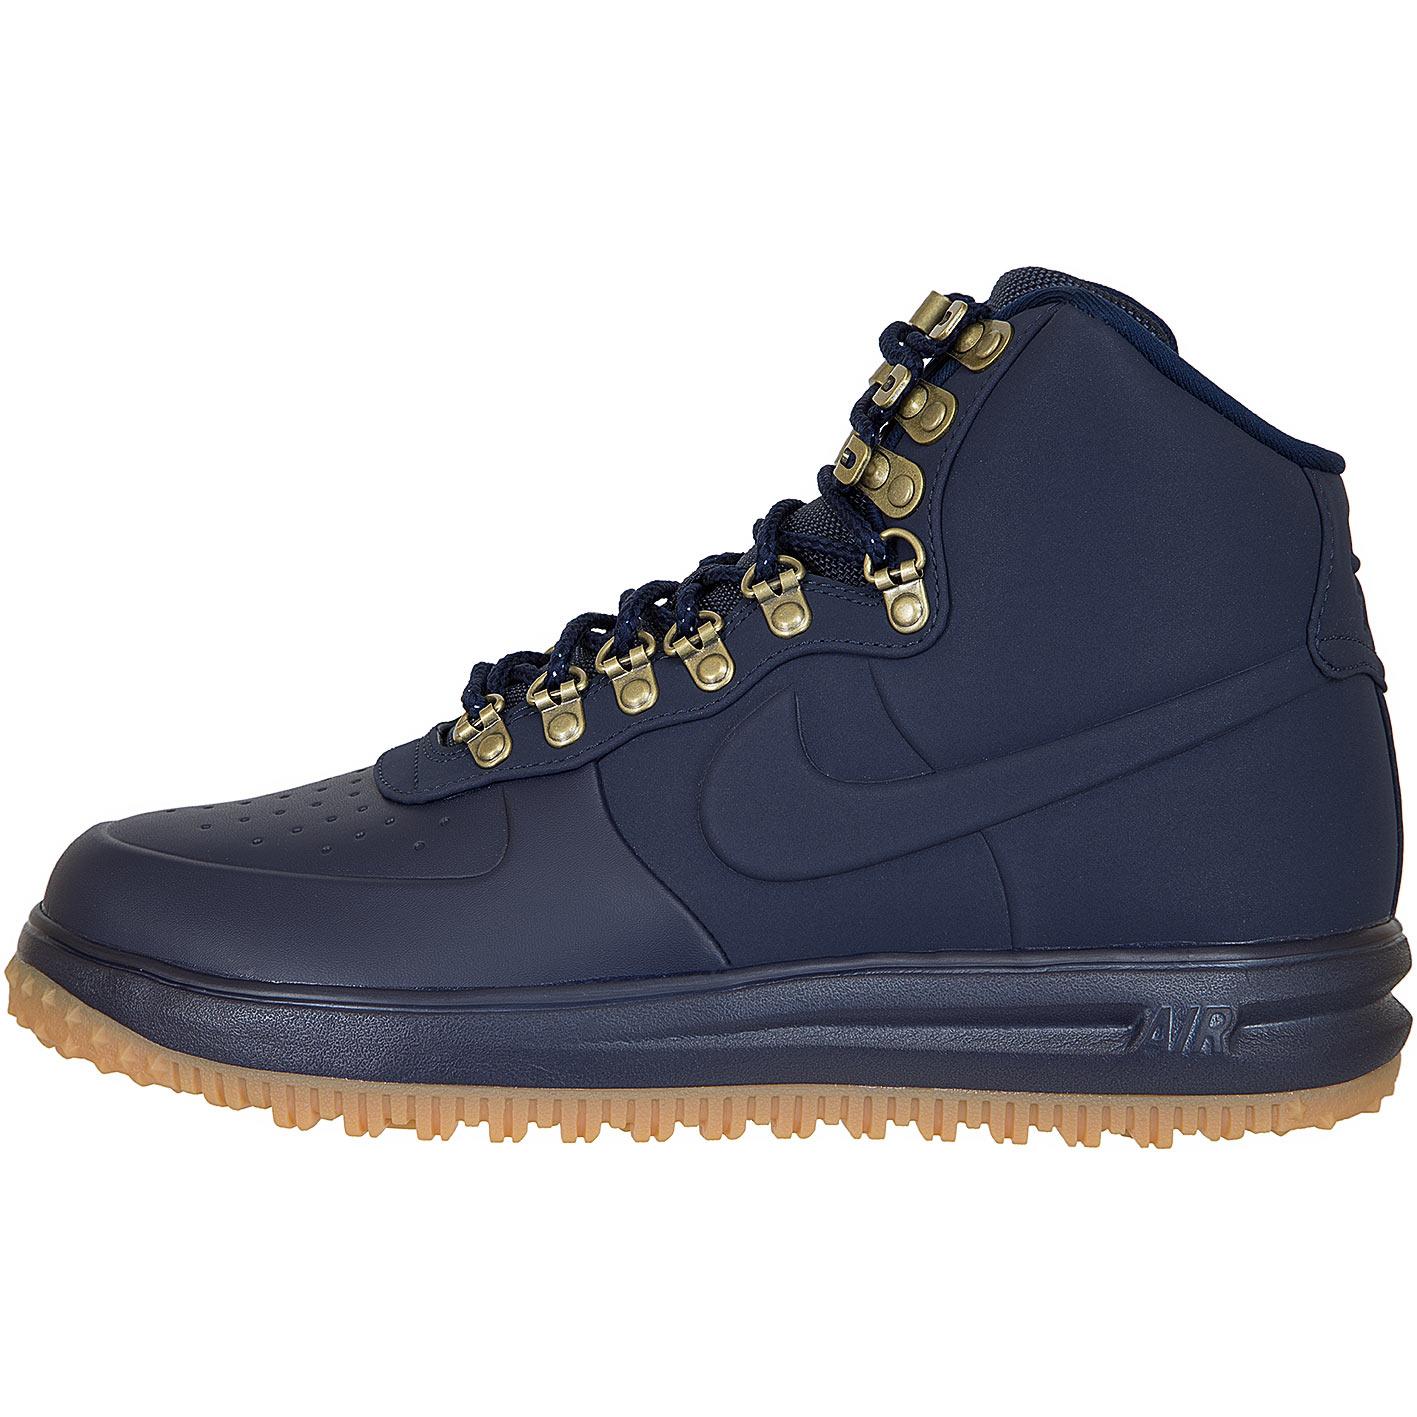 Nike Lunar Force 1 18 Schuhe oliv